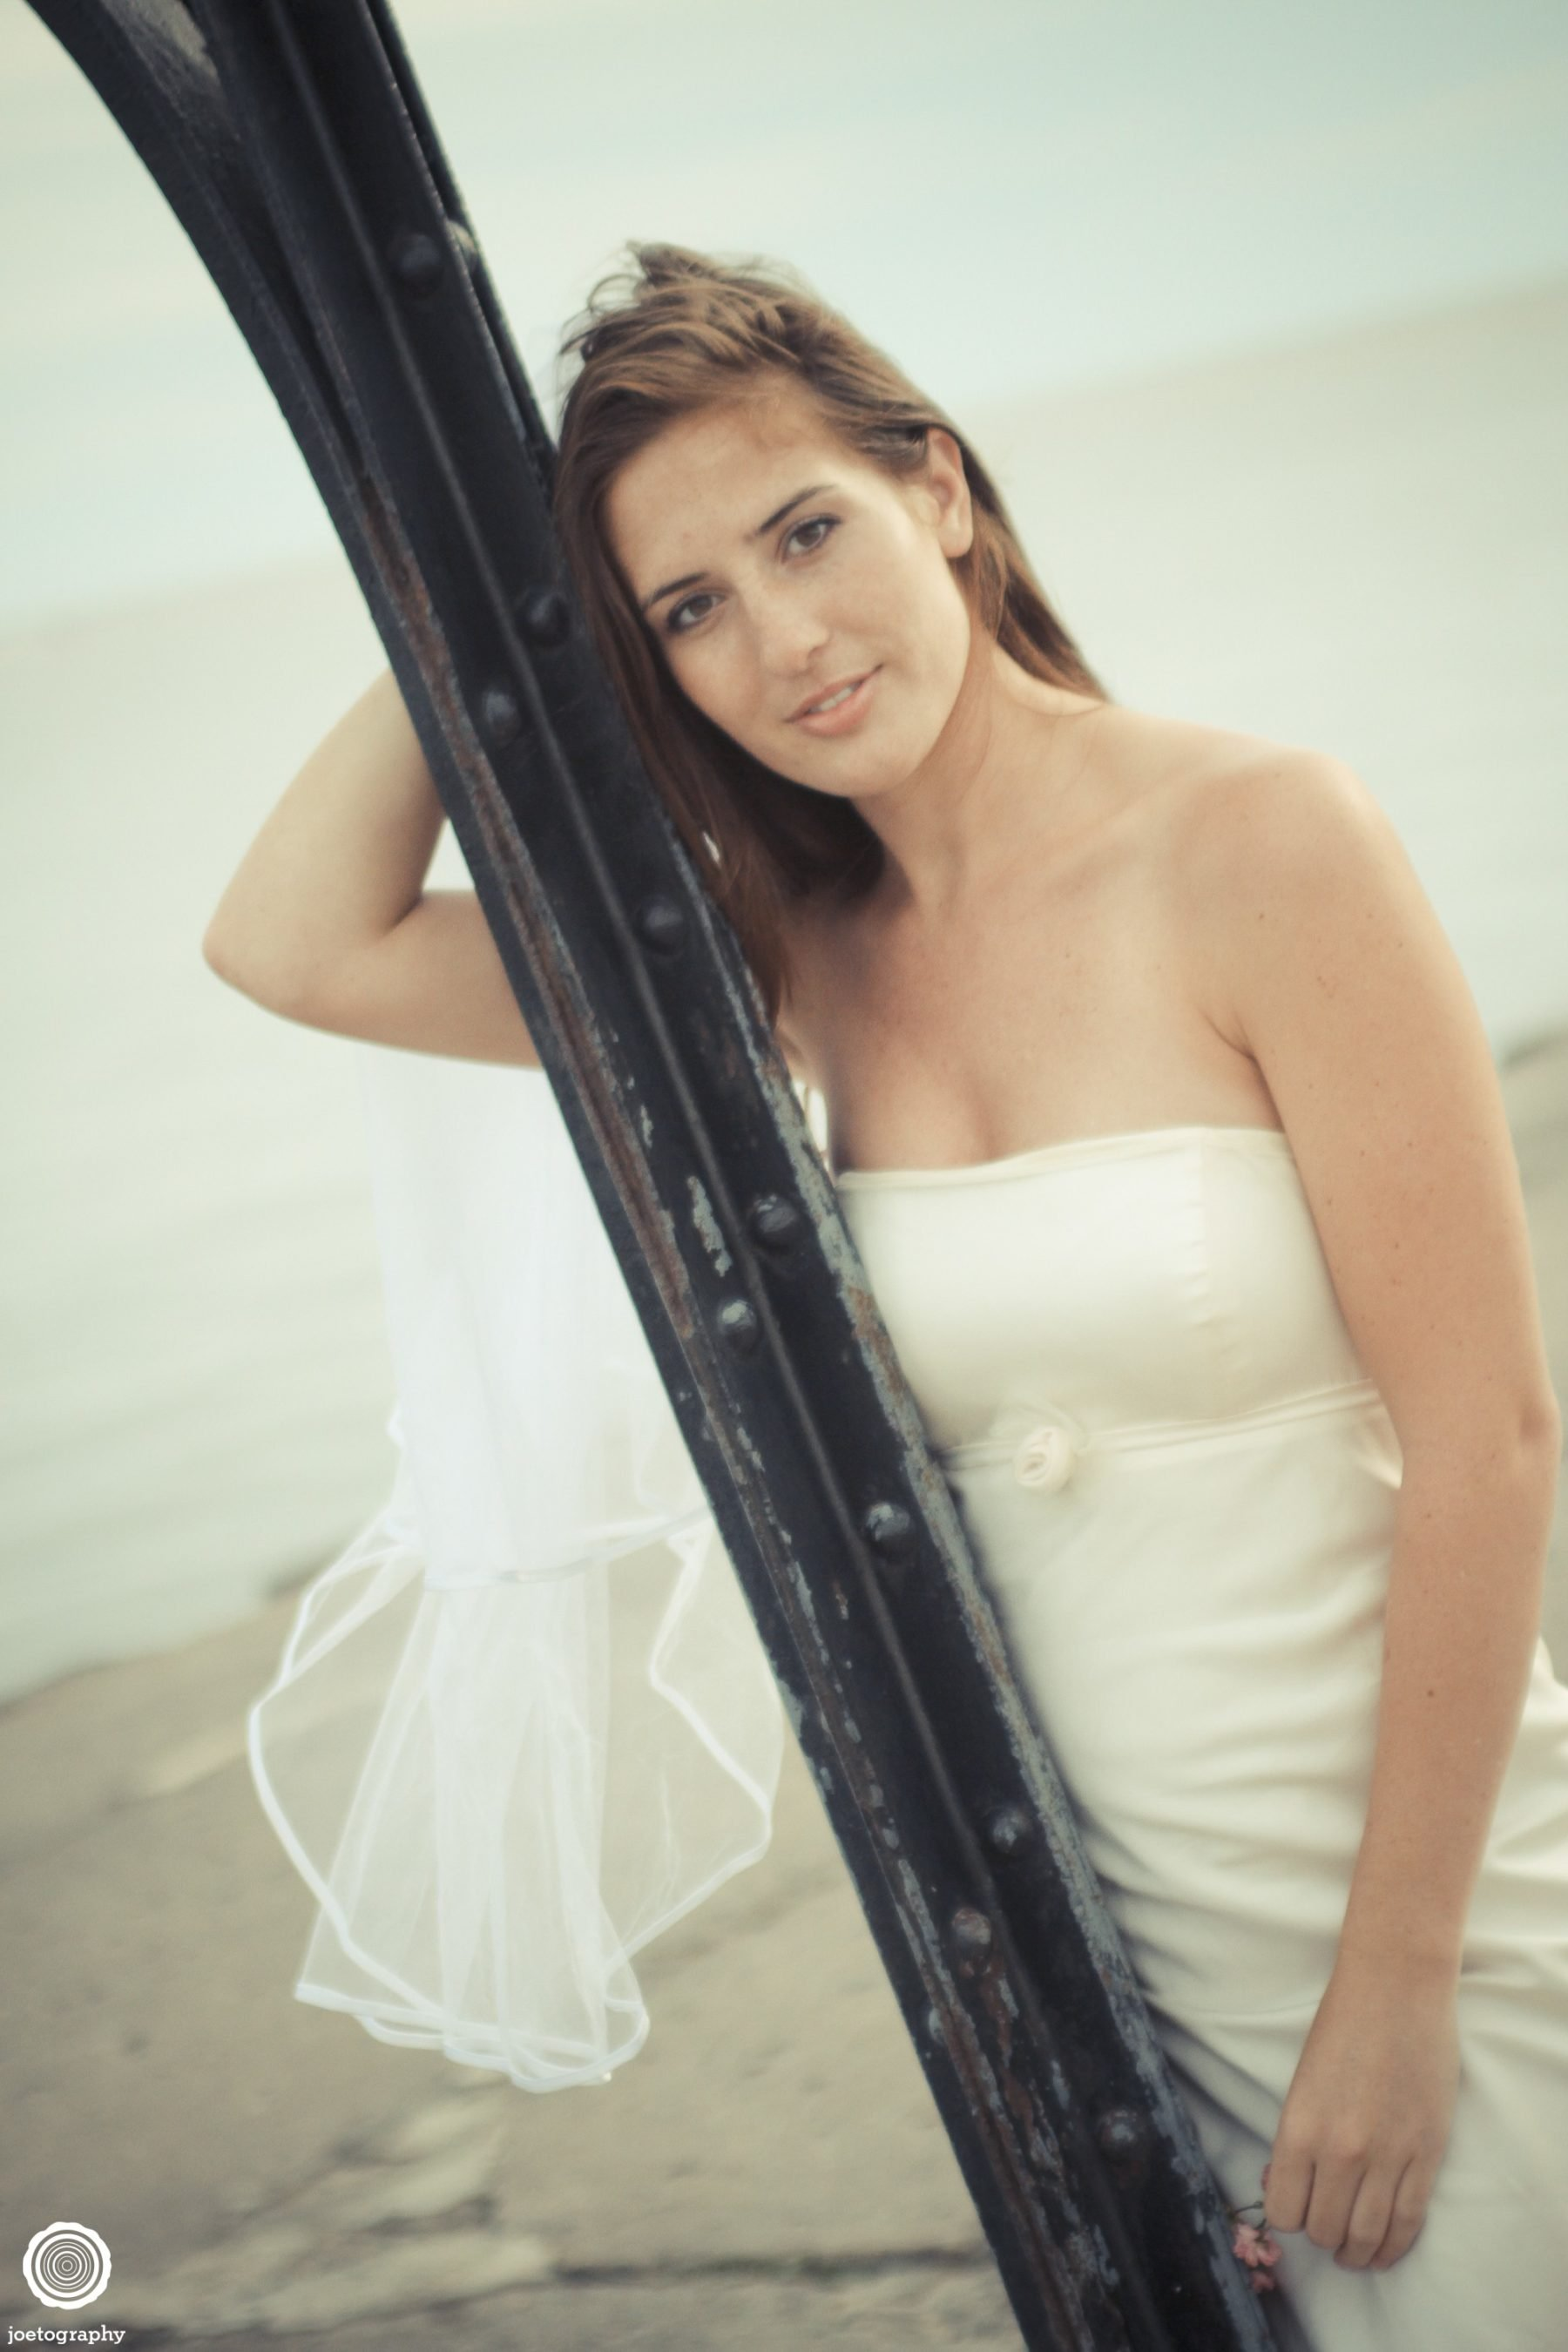 Trash-Wedding-Dress-Photos-Grand-Haven-Michigan-118   Joetography